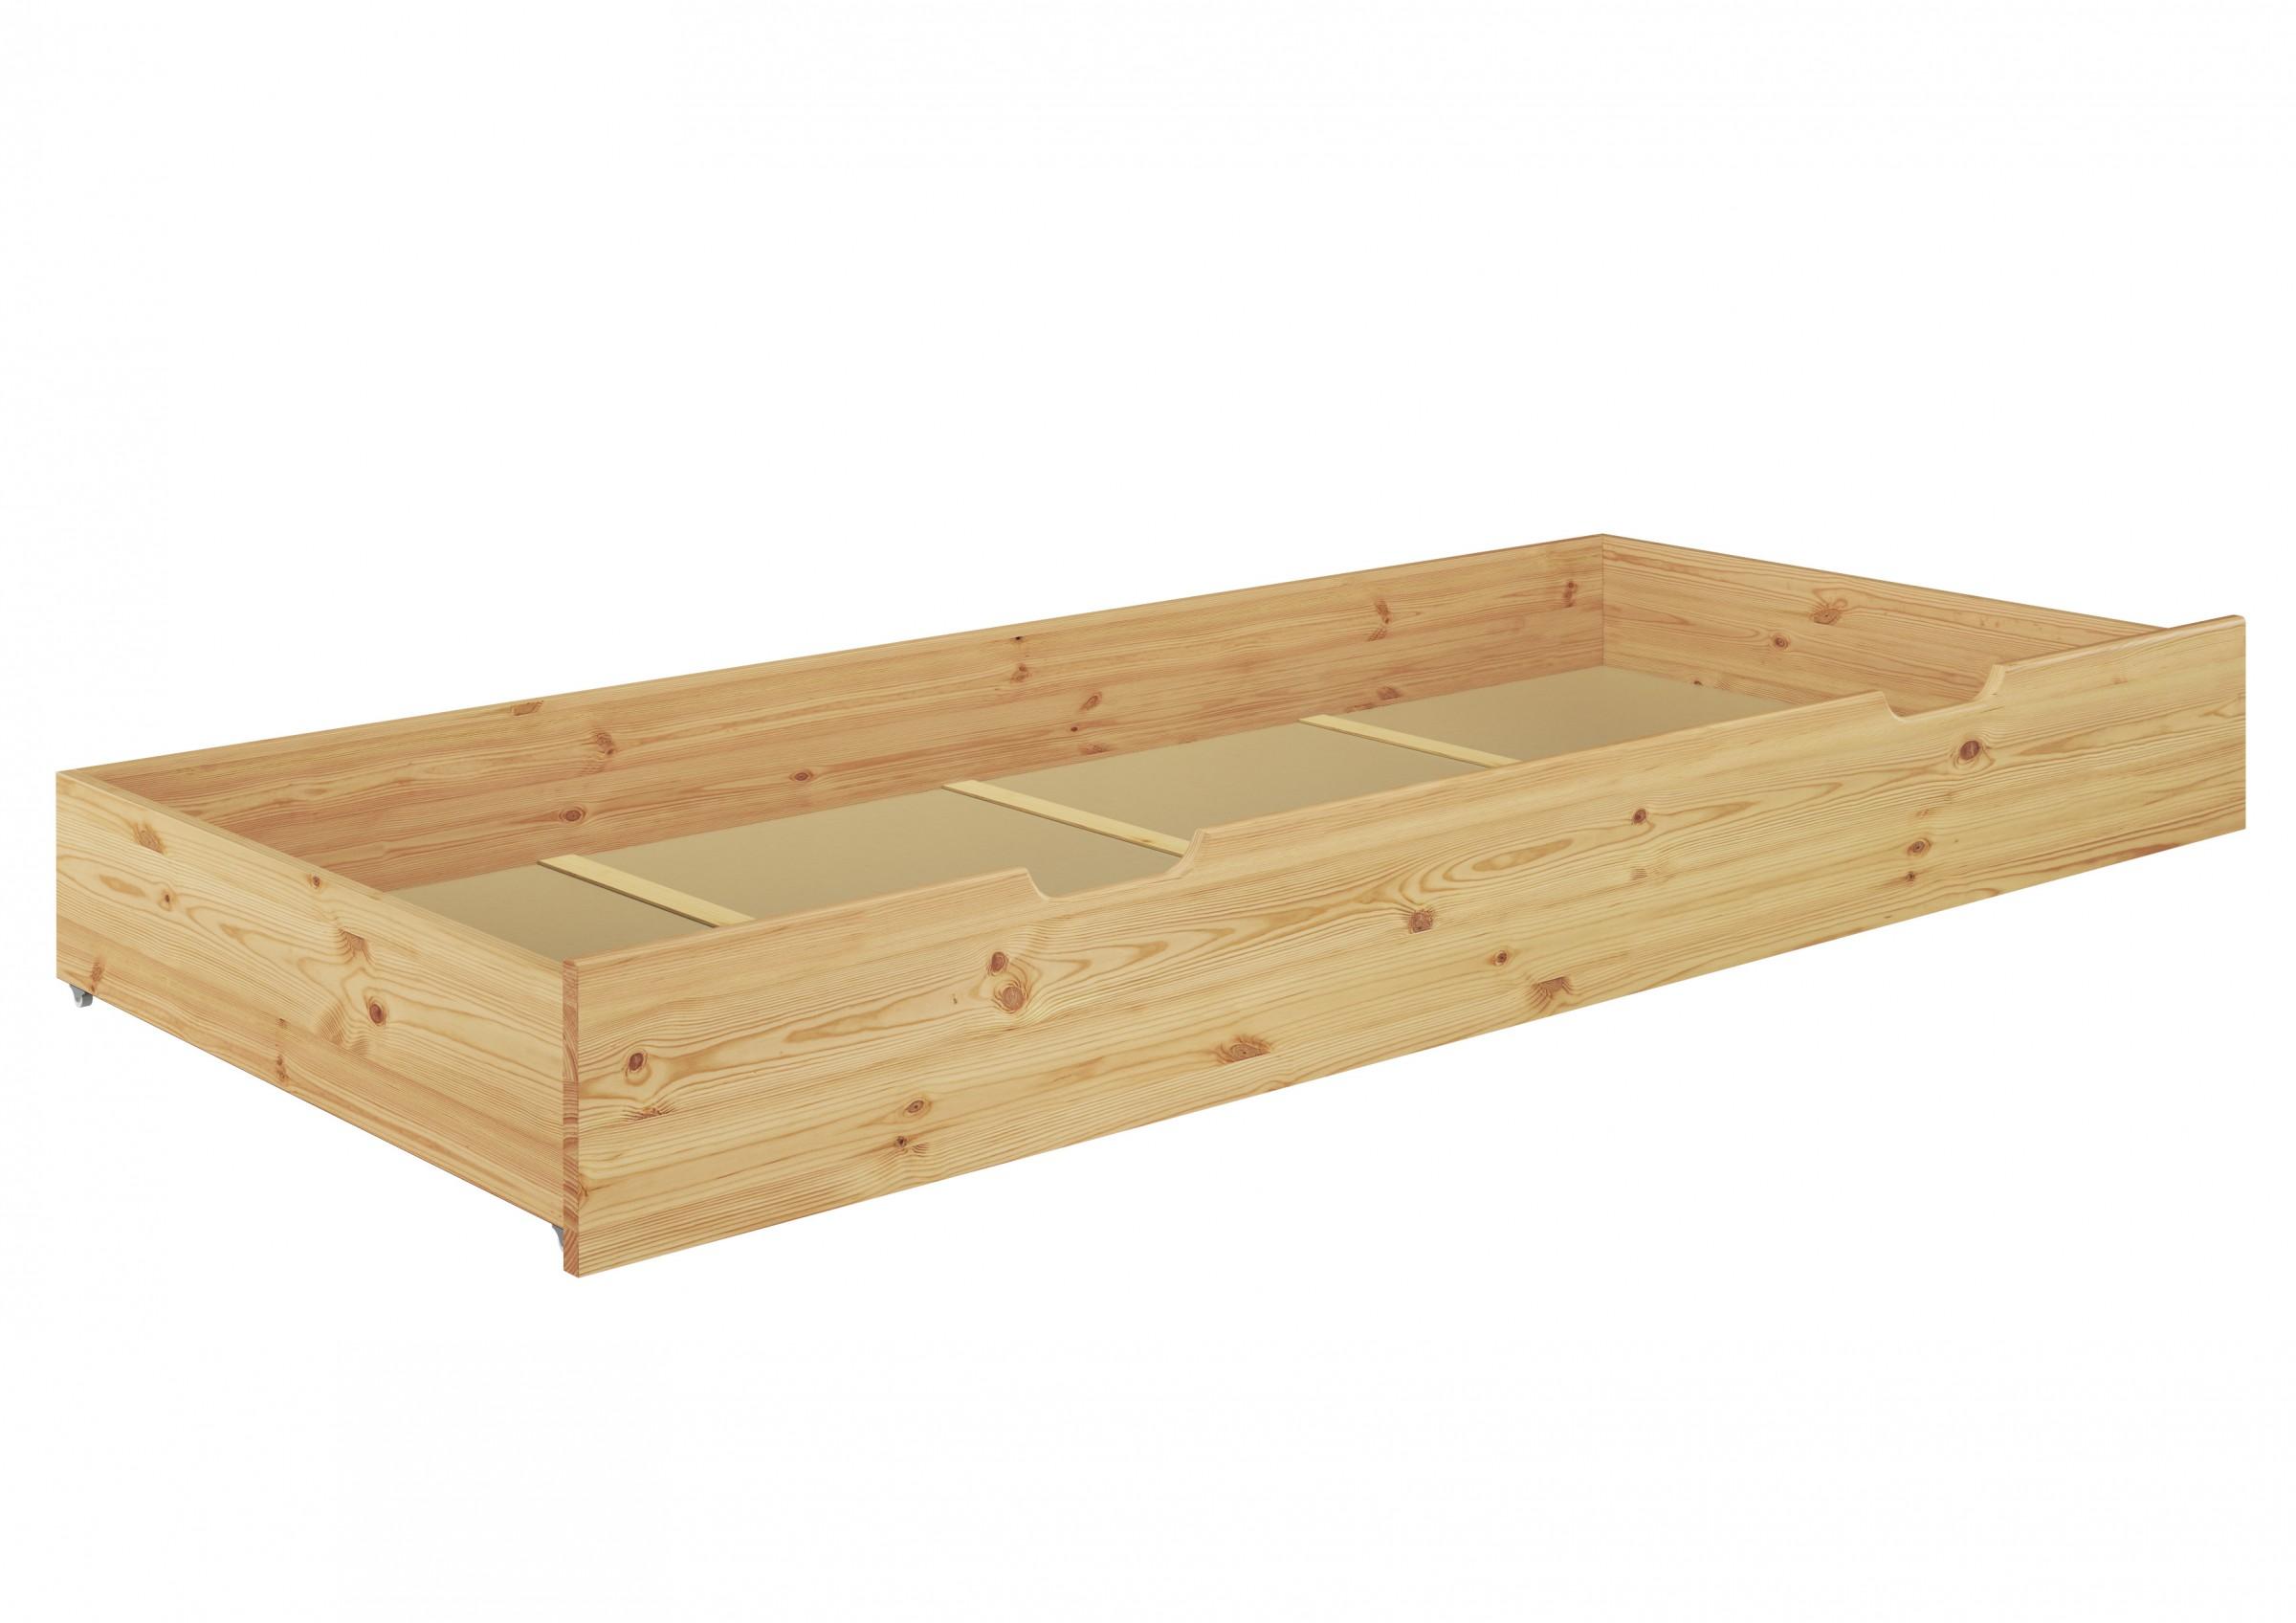 seniorenbett hoch bettkasten 100x200 kiefer holzbett einzelbett s4 ebay. Black Bedroom Furniture Sets. Home Design Ideas